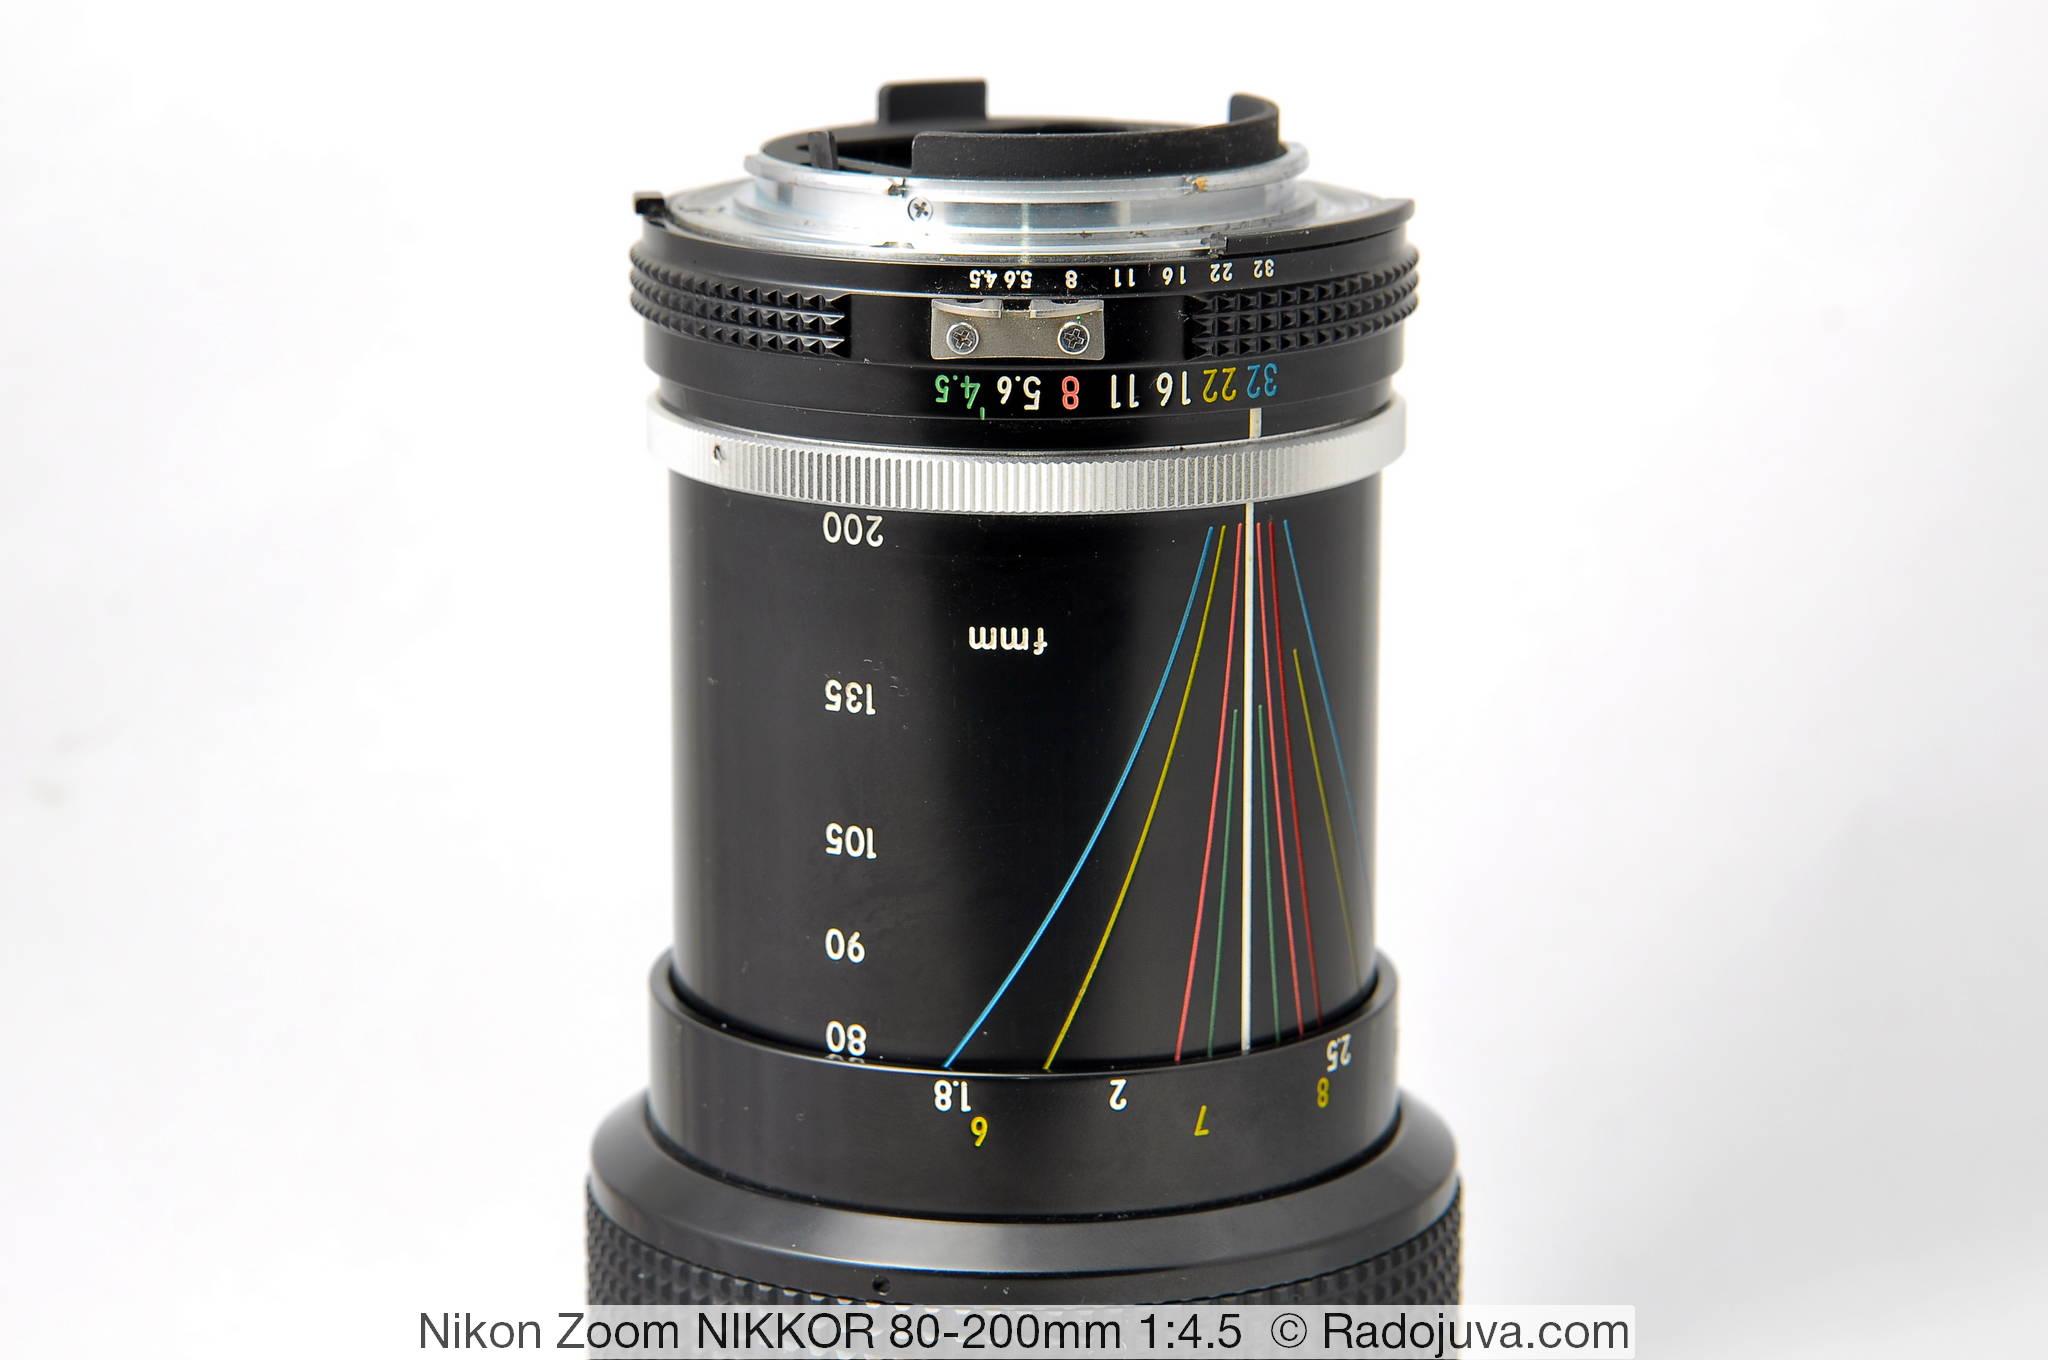 Nikon Zoom NIKKOR 80-200mm 1:4.5 (AI, MKII)